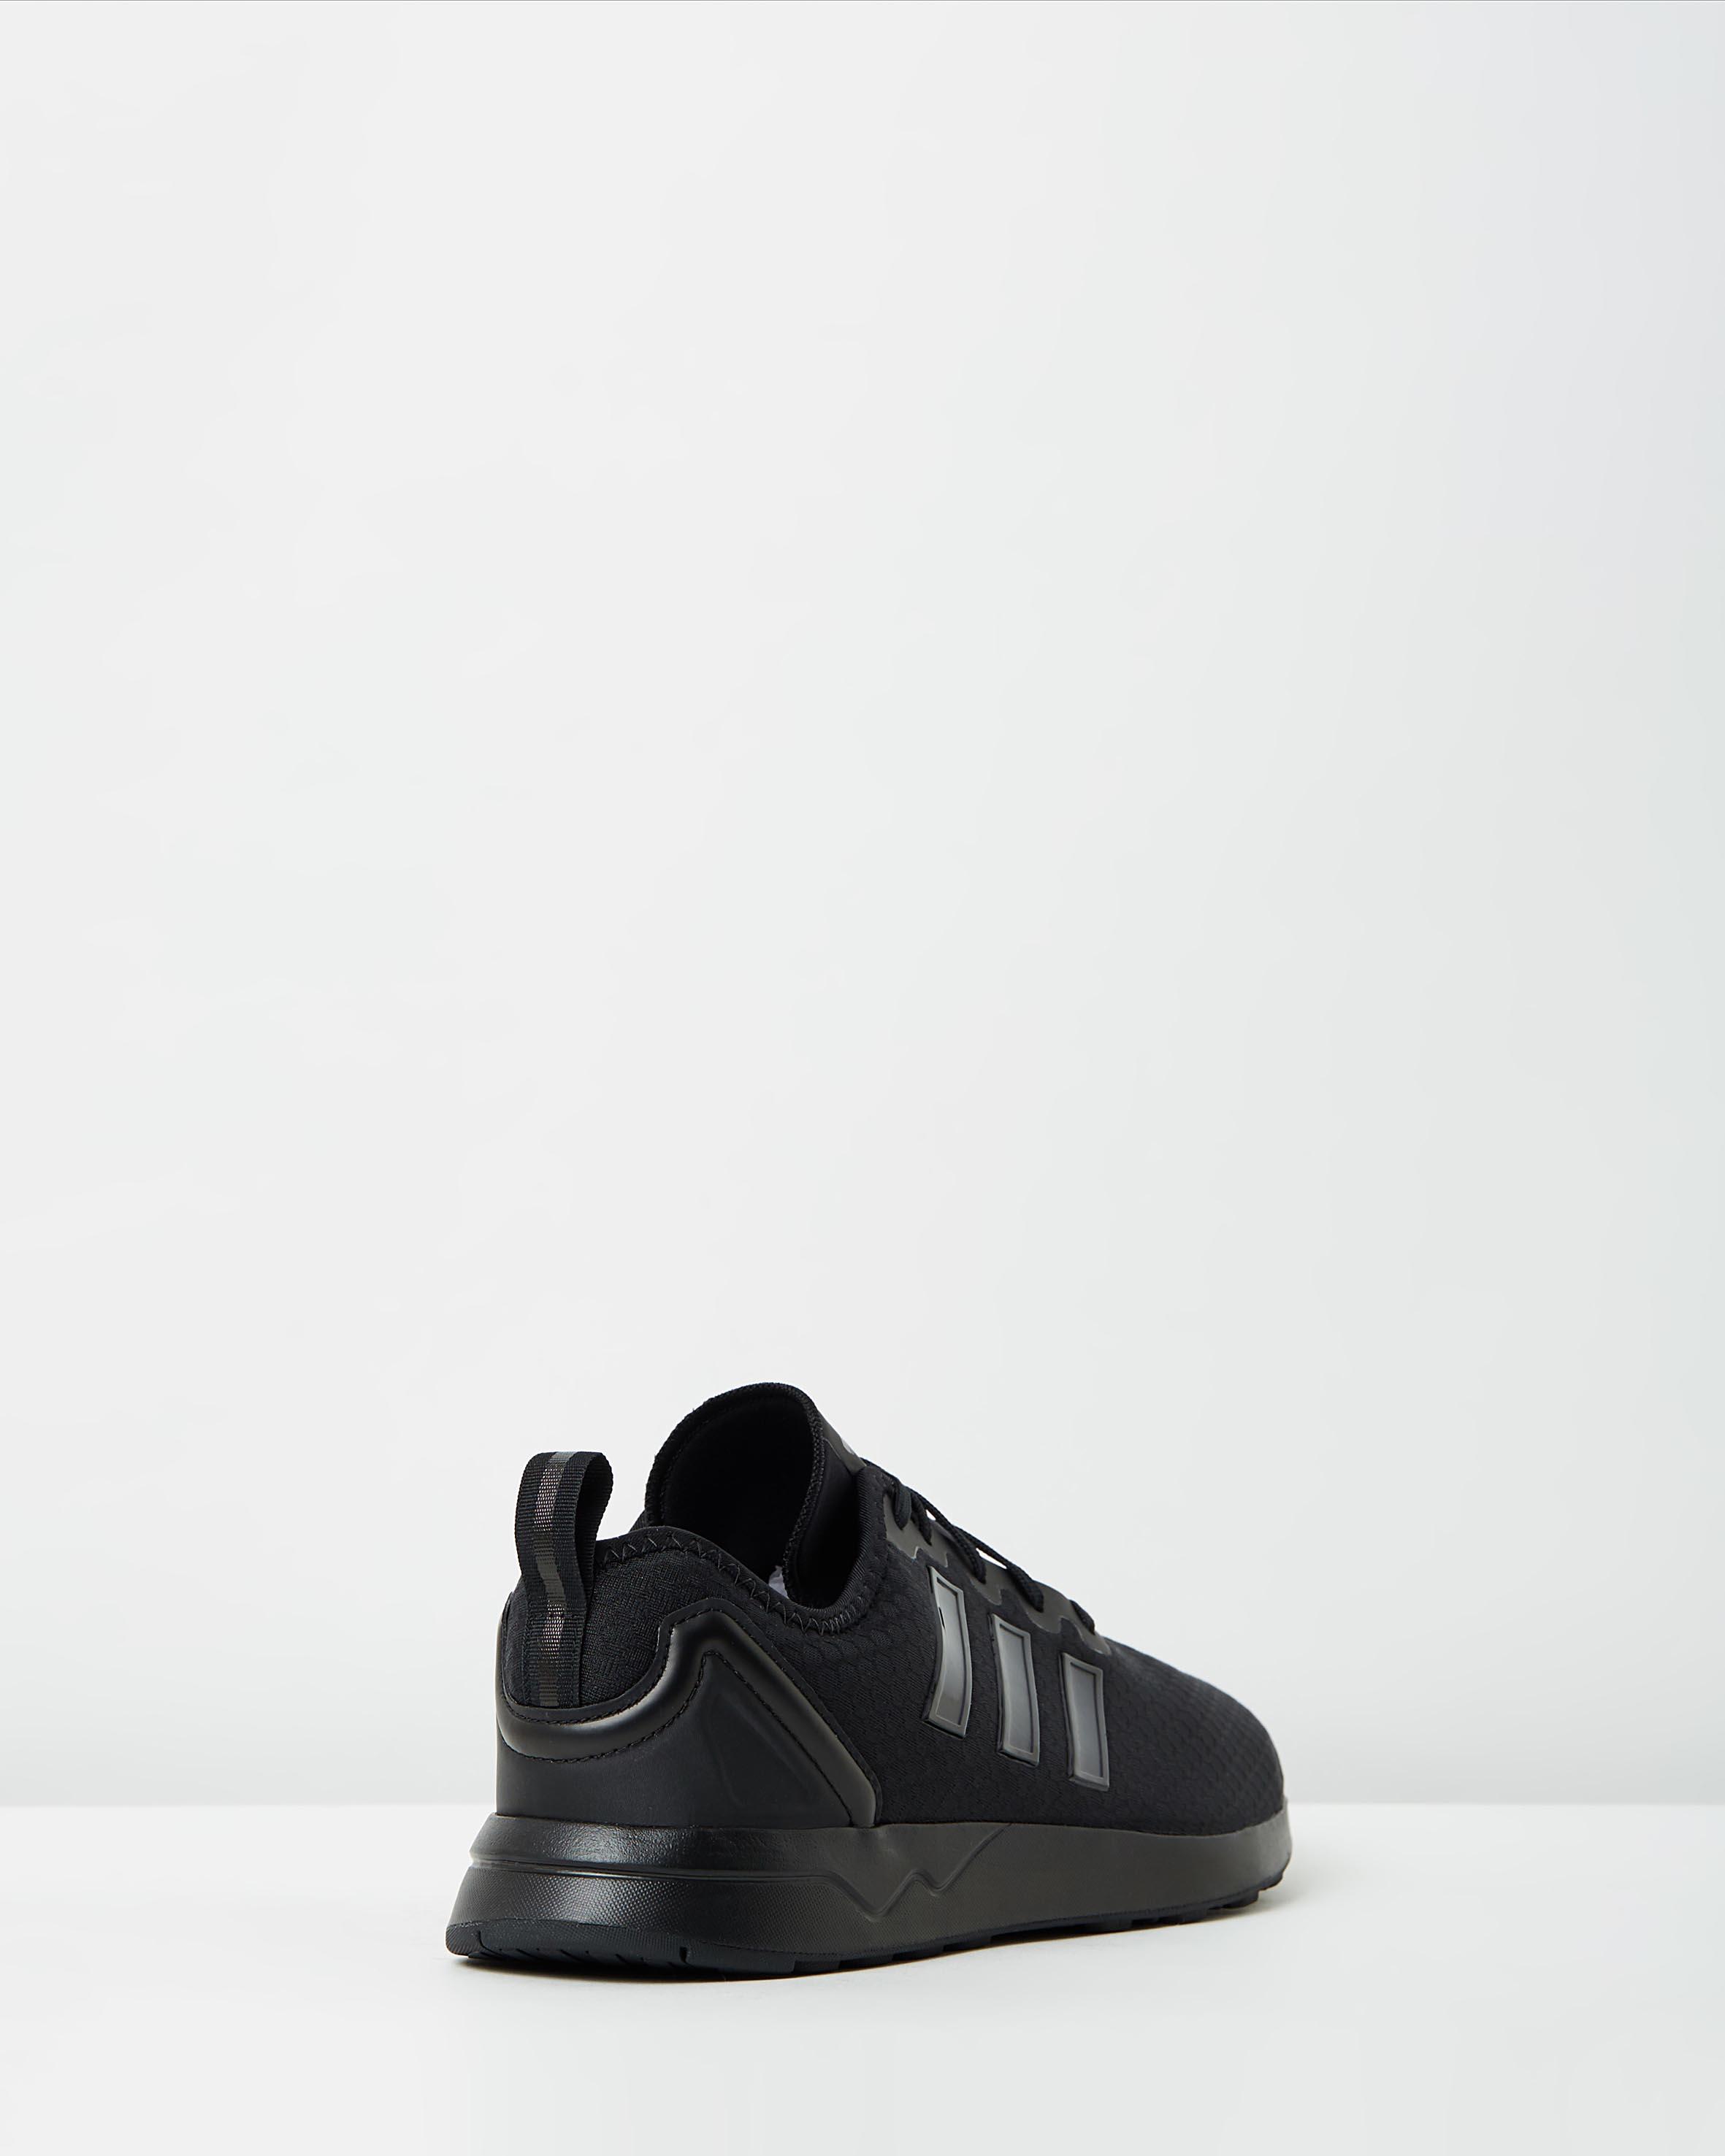 best sneakers d85ff 5393e Adidas Men's ZX Flux ADV Black